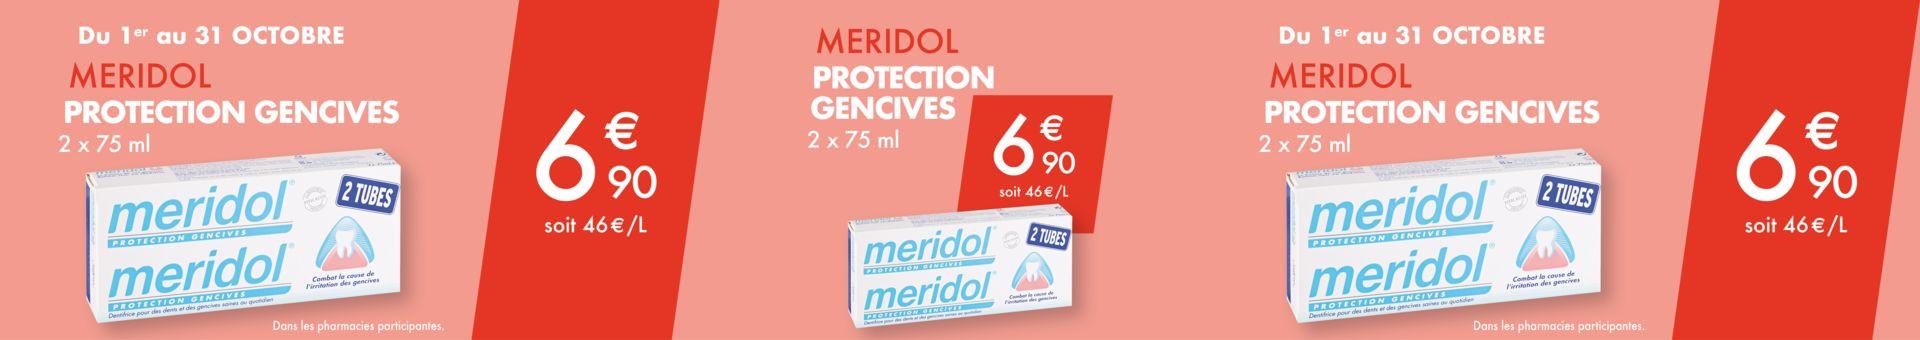 Pharmacie Saint Mesmin,SAINT-PRYVÉ-SAINT-MESMIN